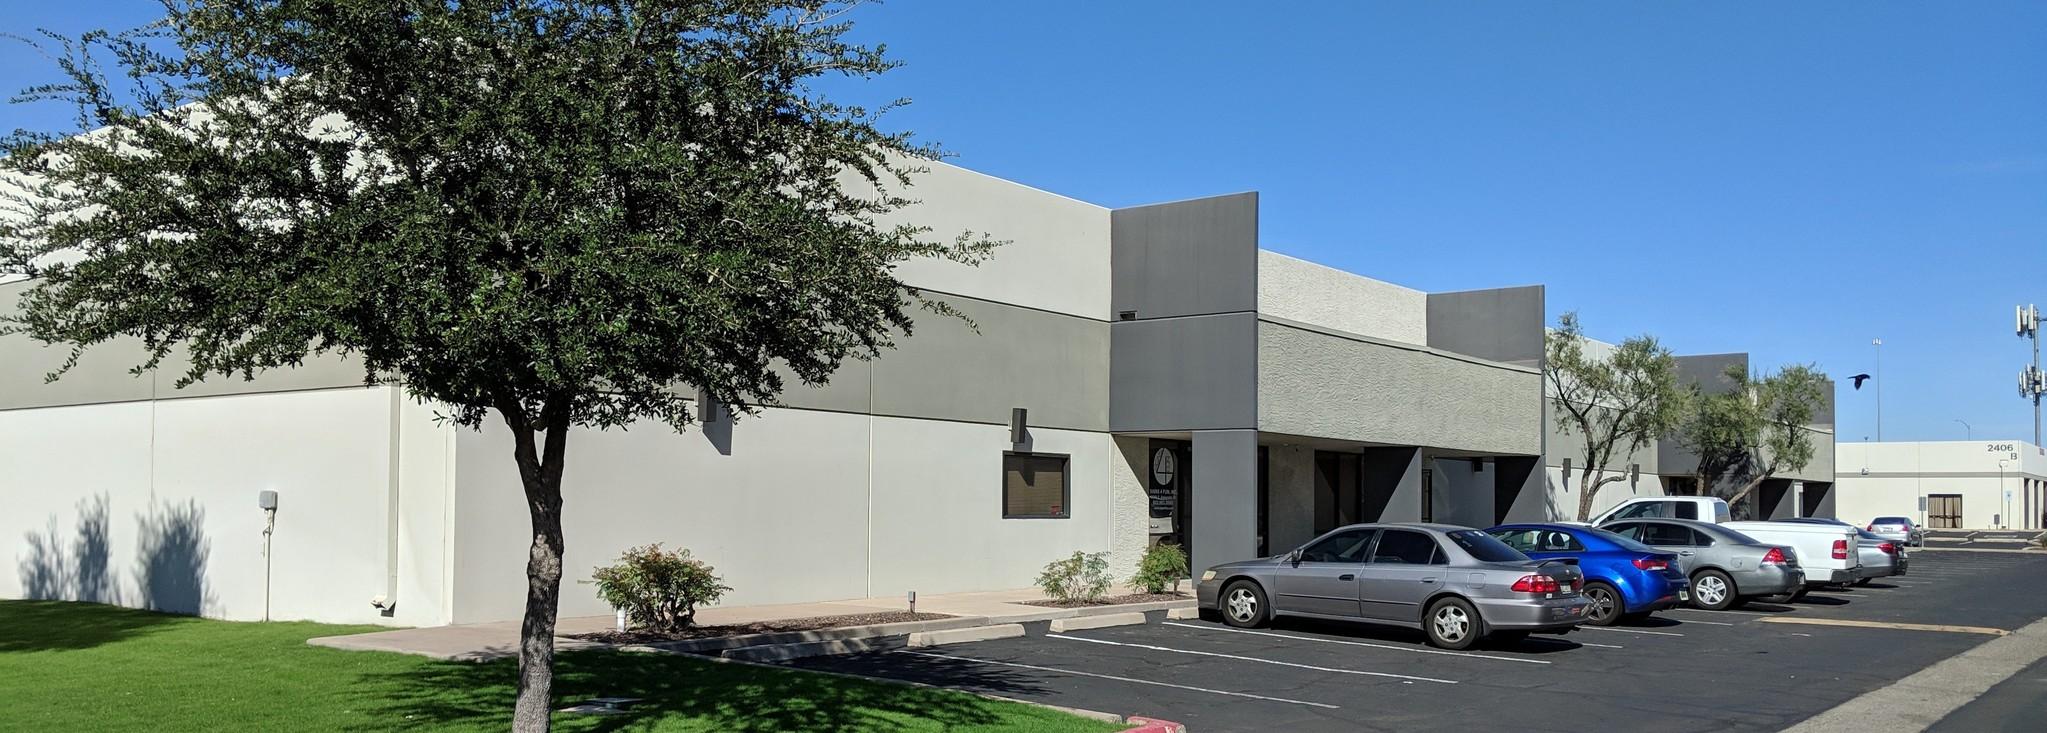 2346 E University Dr, Phoenix AZ 85034 Industrial Condo